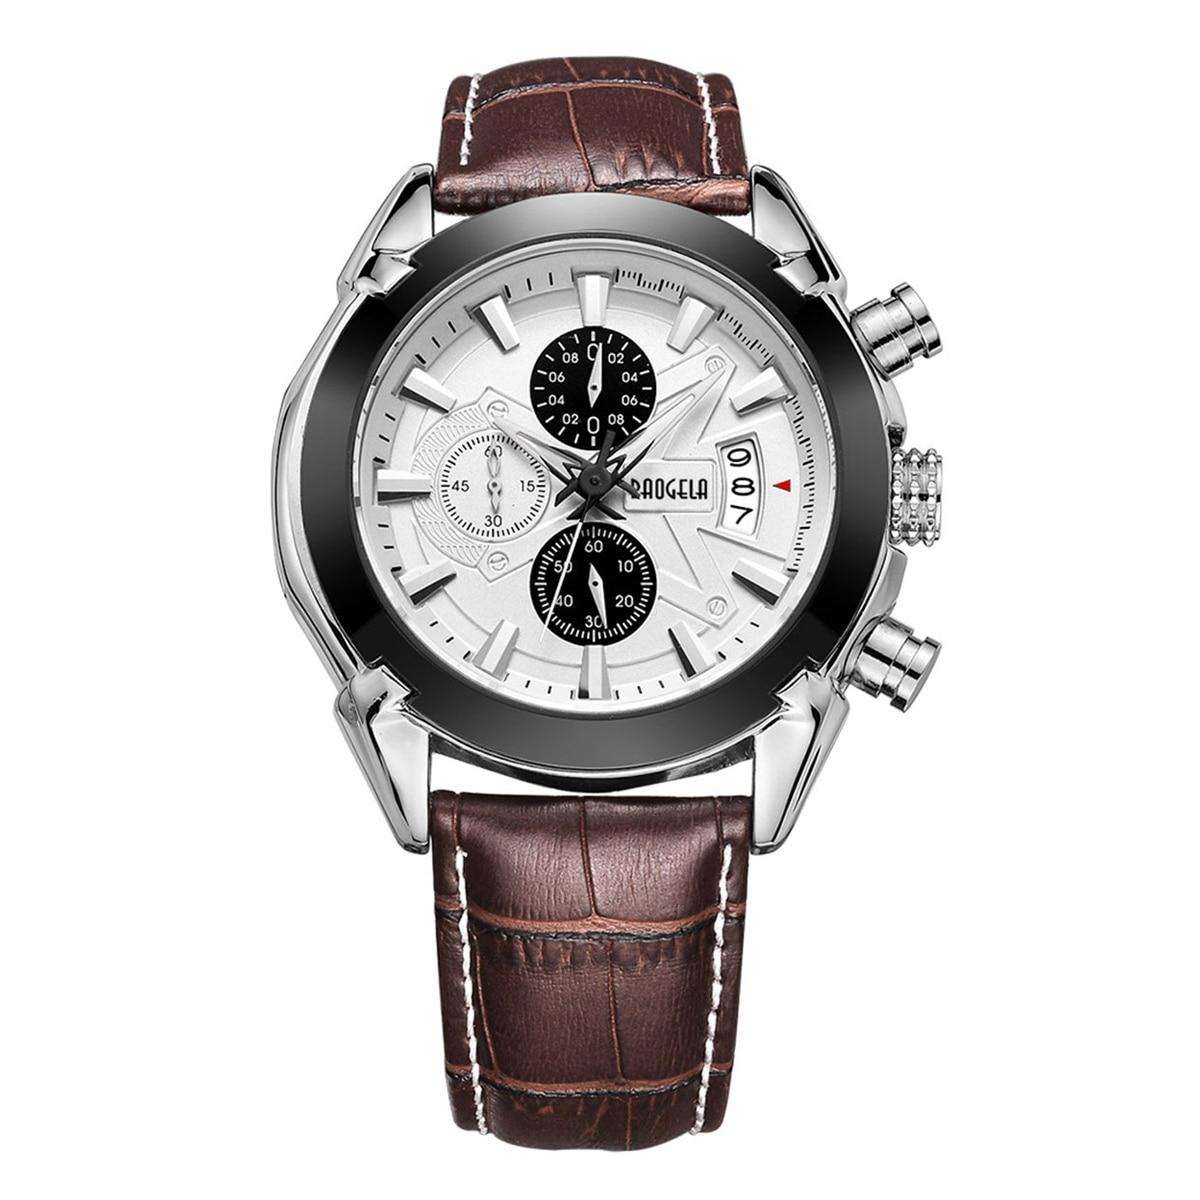 BAOGELA Mens Chronograph Luminous Hands Date Indicator Fashion Causal Leather Strap Sport Quartz Wrist Watches 1602 все цены